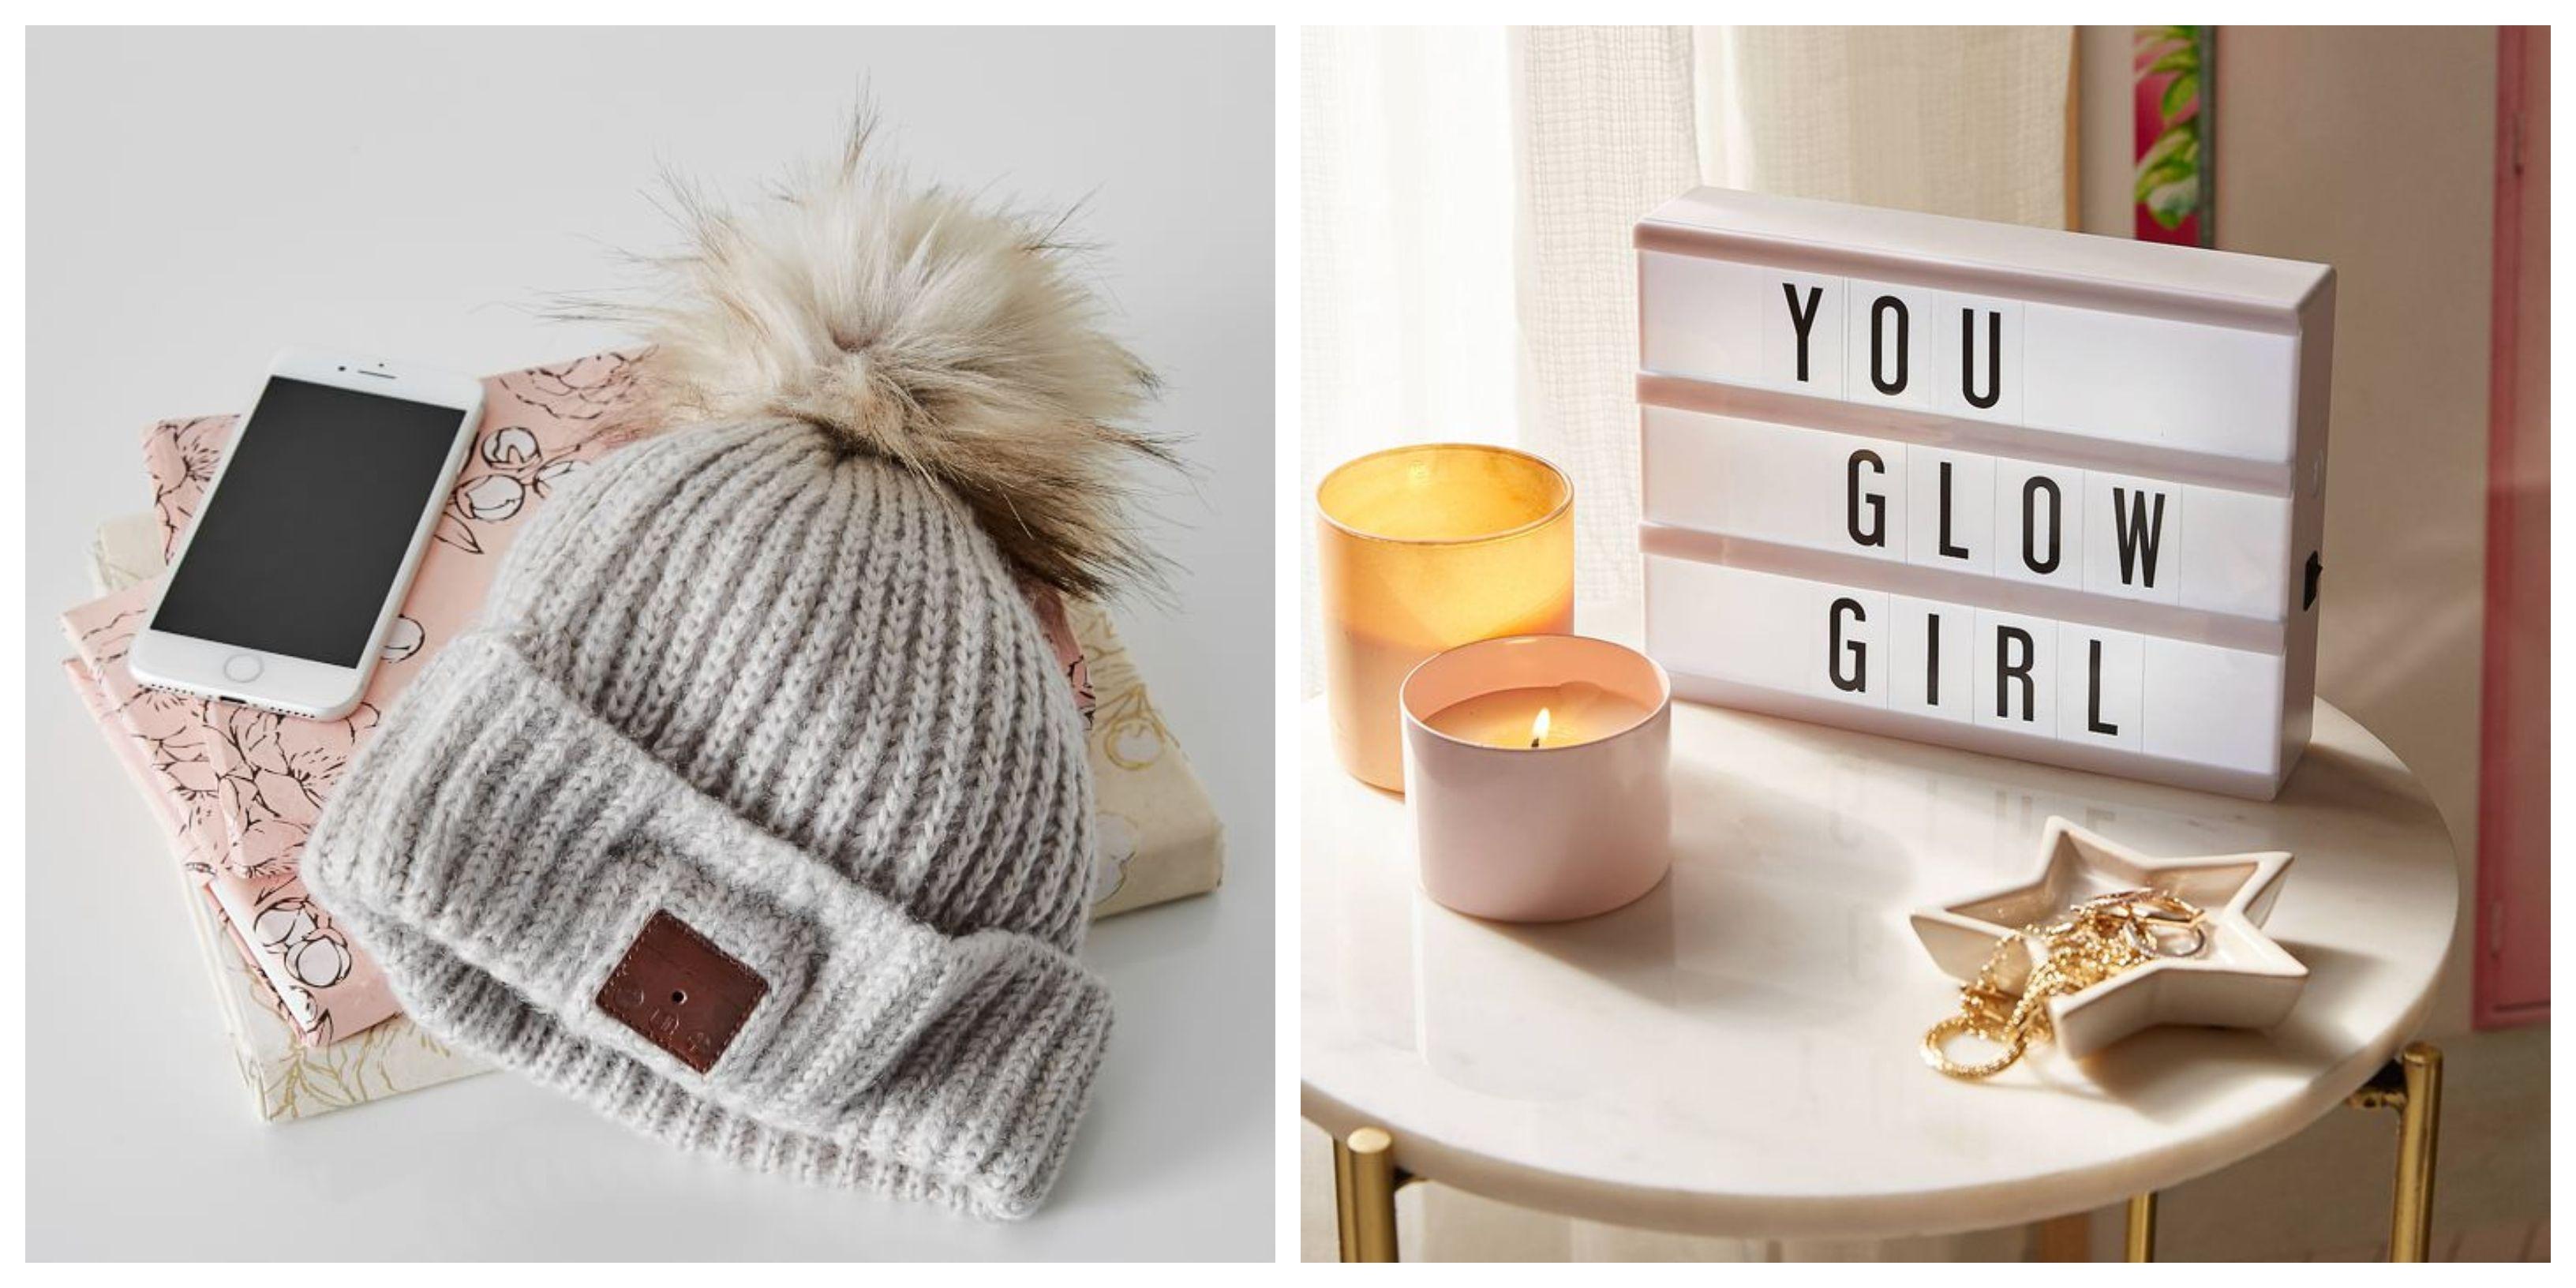 Top 25 teen christmas gift ideas